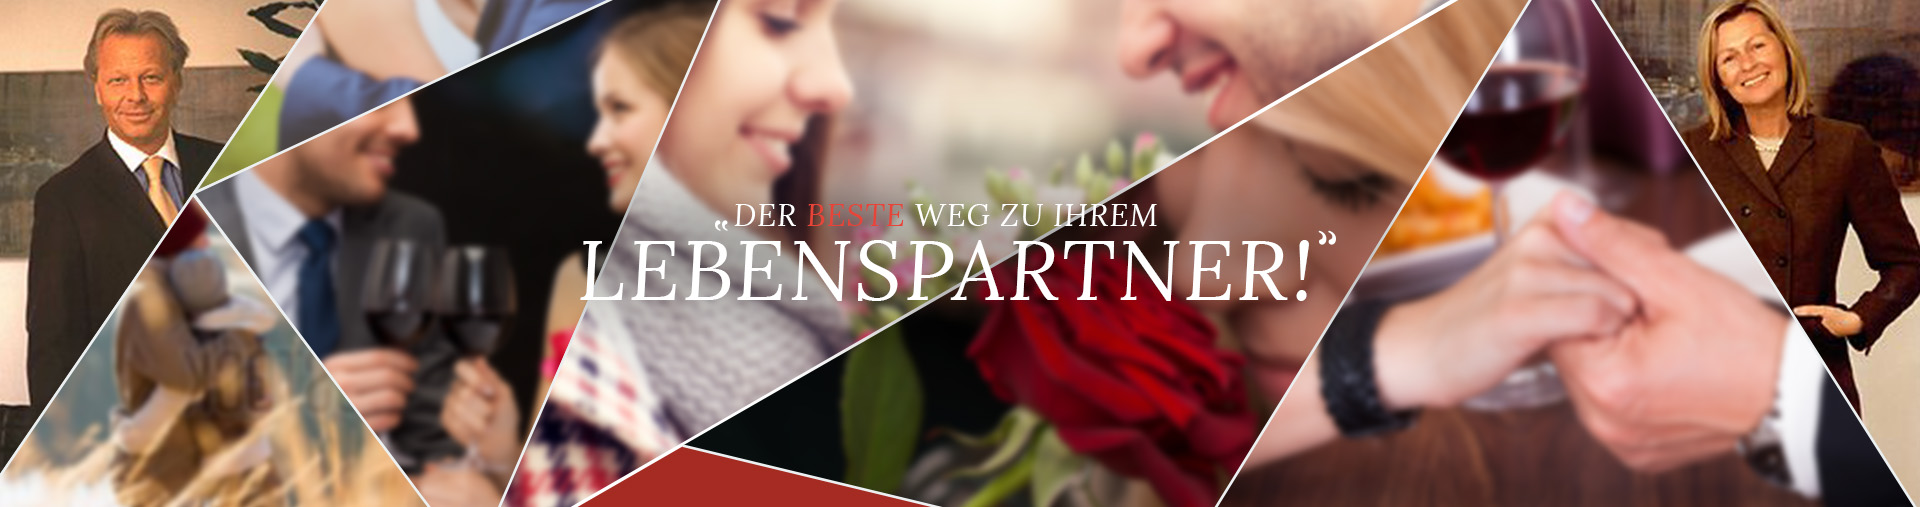 Partnervermittlung Angela Hiltbrand